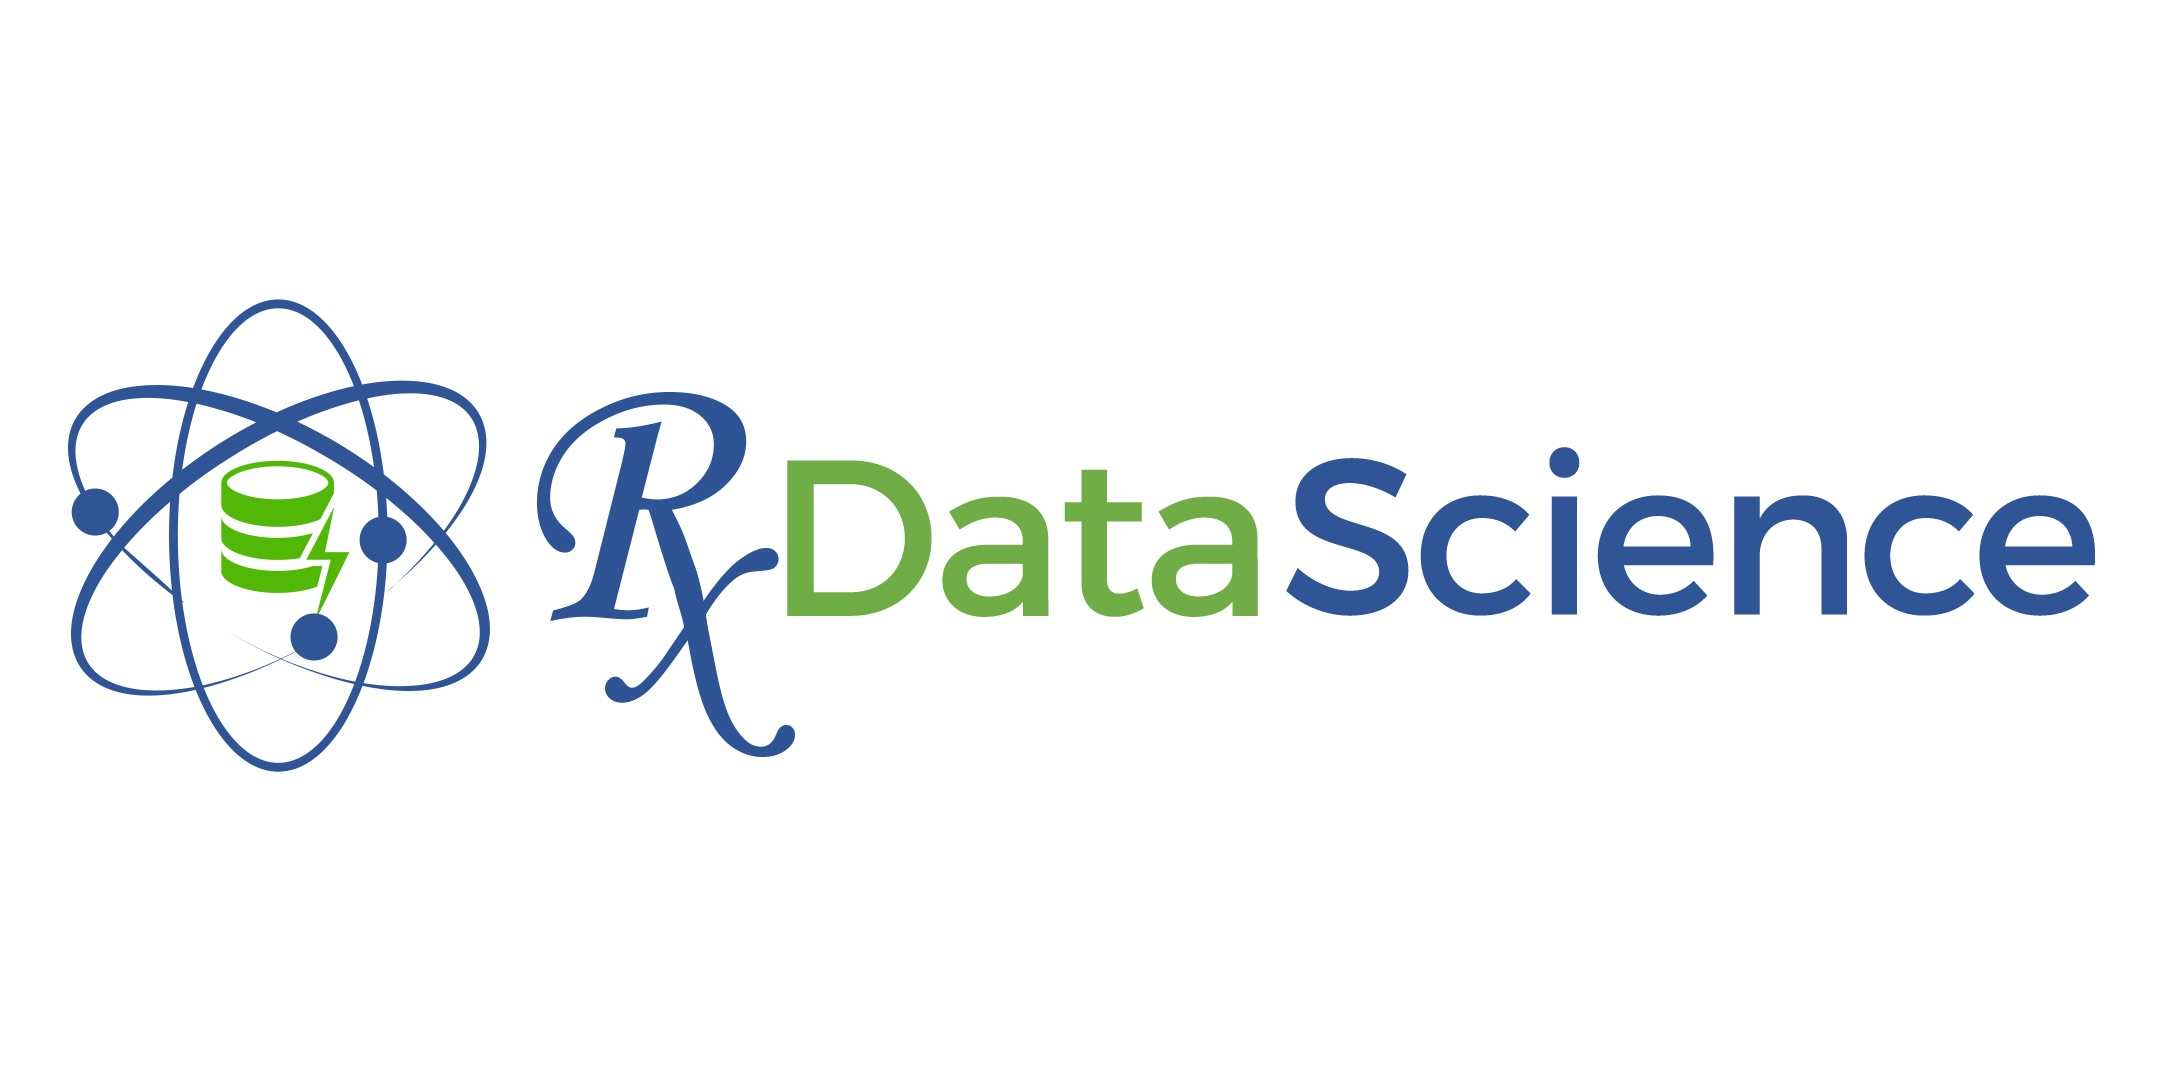 RxDataScience